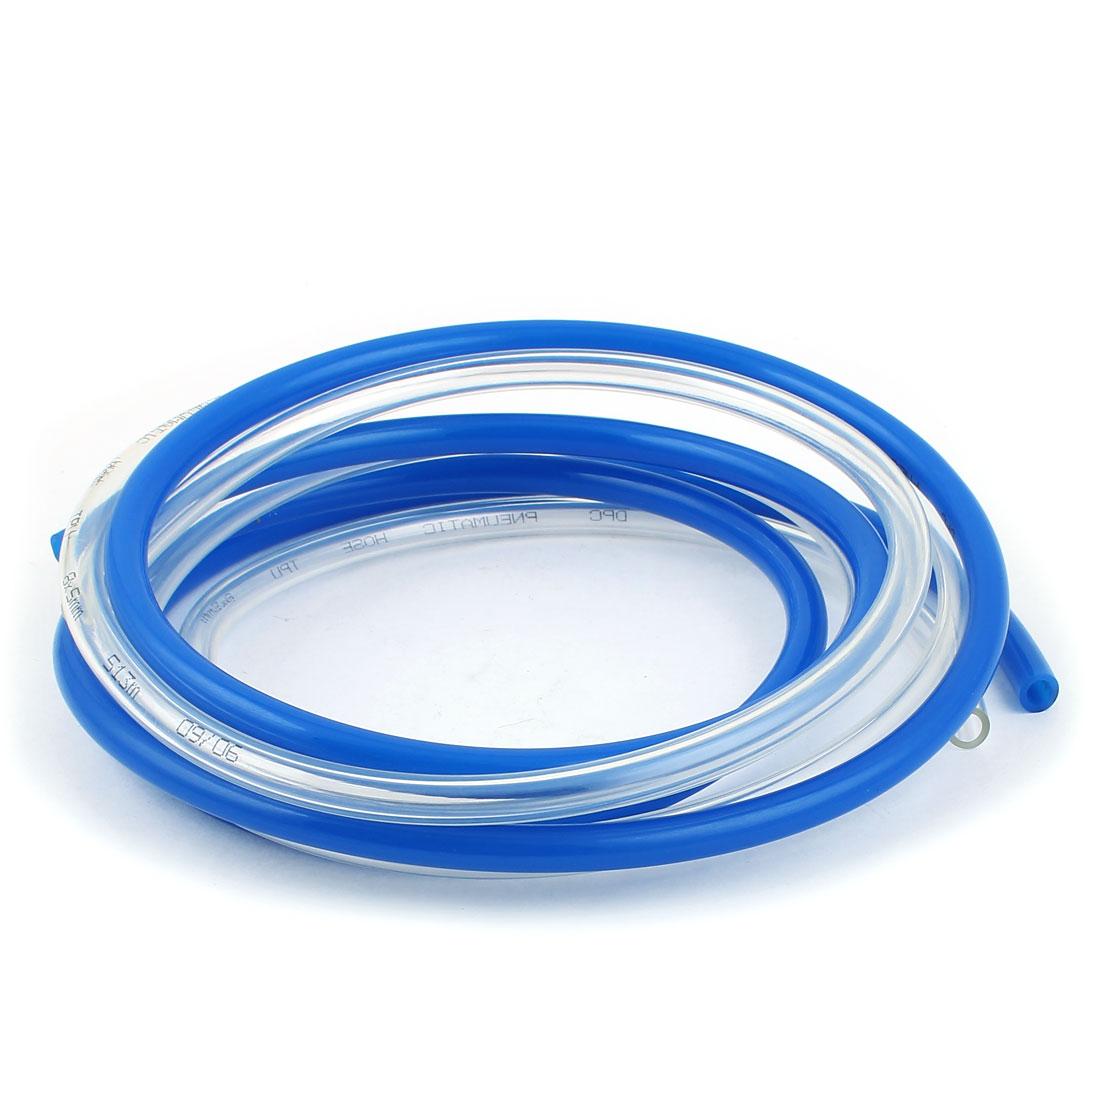 PU Polyurethane Flexible Air Tubing Pneumatic Pipe Tube Hose 8x5mm 1.58M 2Pcs